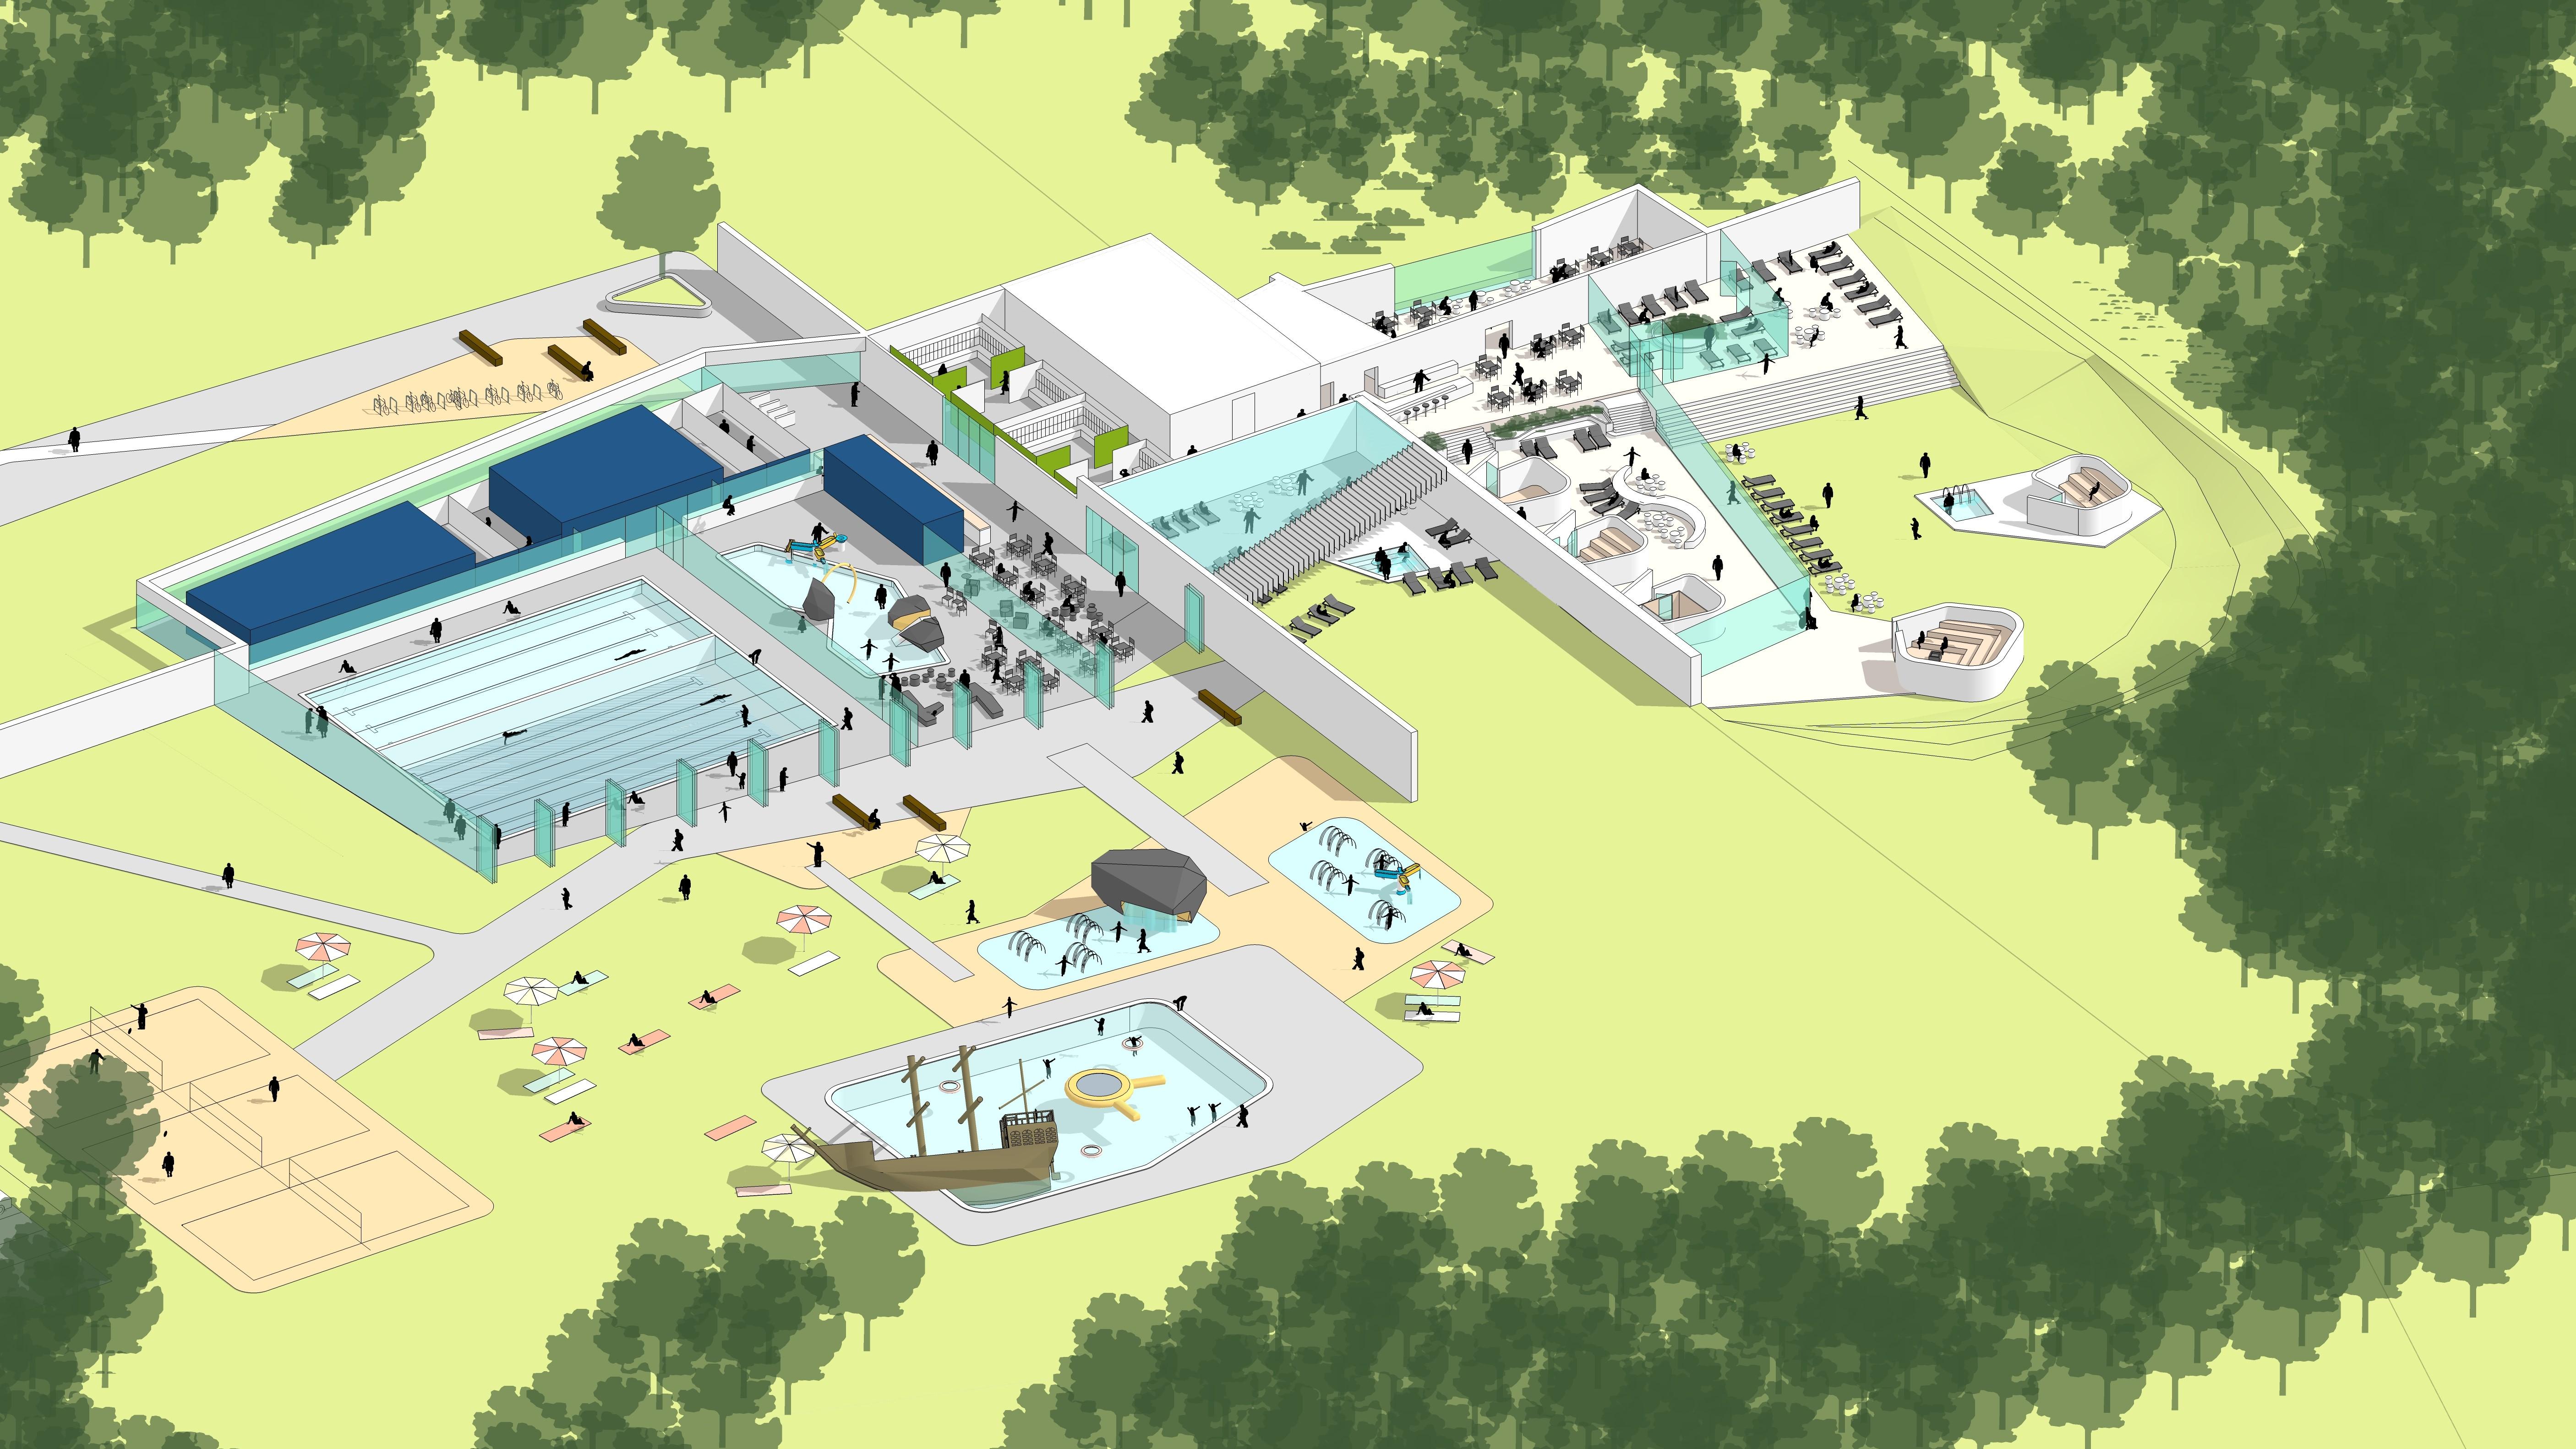 Schwimmbadplan Dachverband 2019